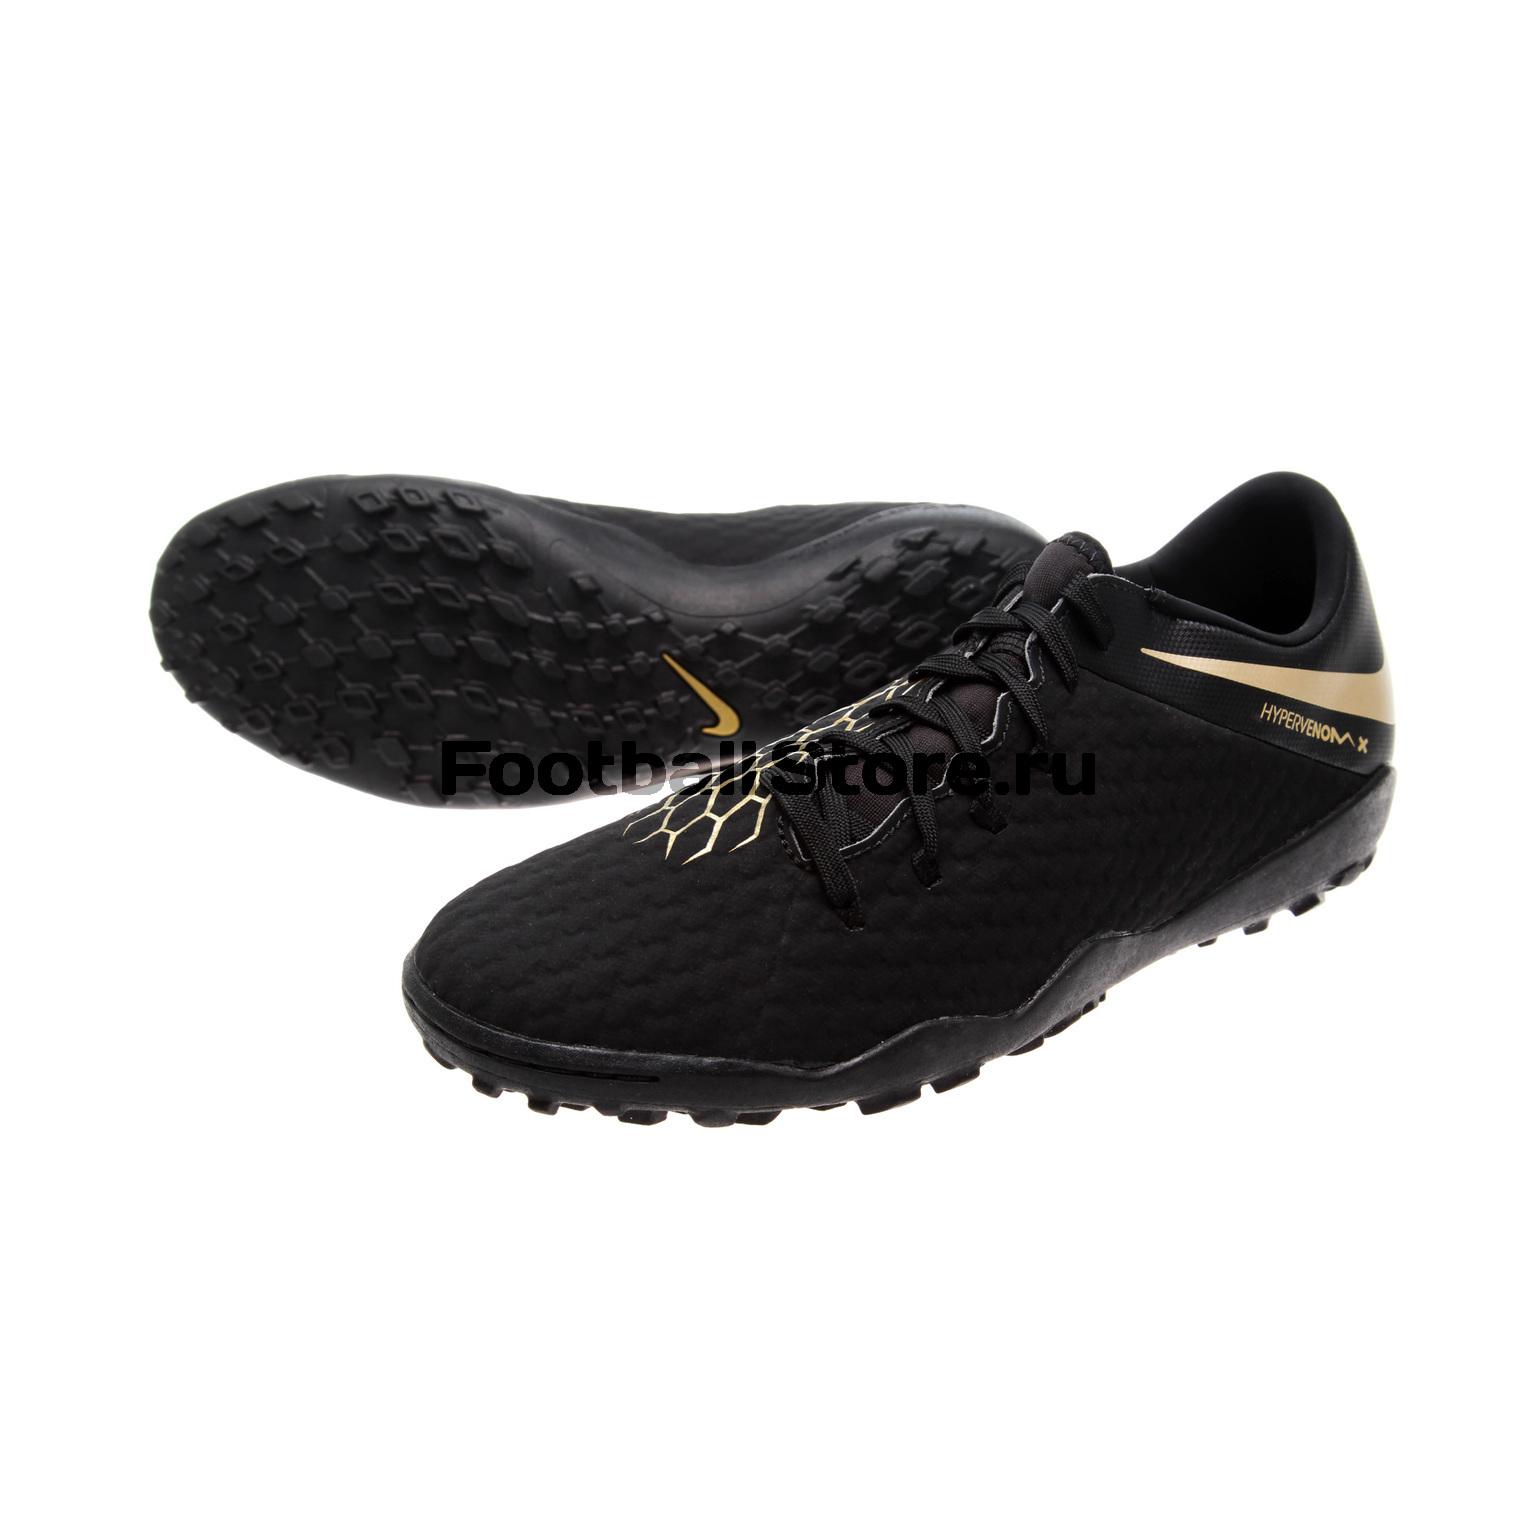 Шиповки Nike Hypervenom 3 Academy TF AJ3815-090 бутсы nike jr hypervenom 3 club fg aj4146 090